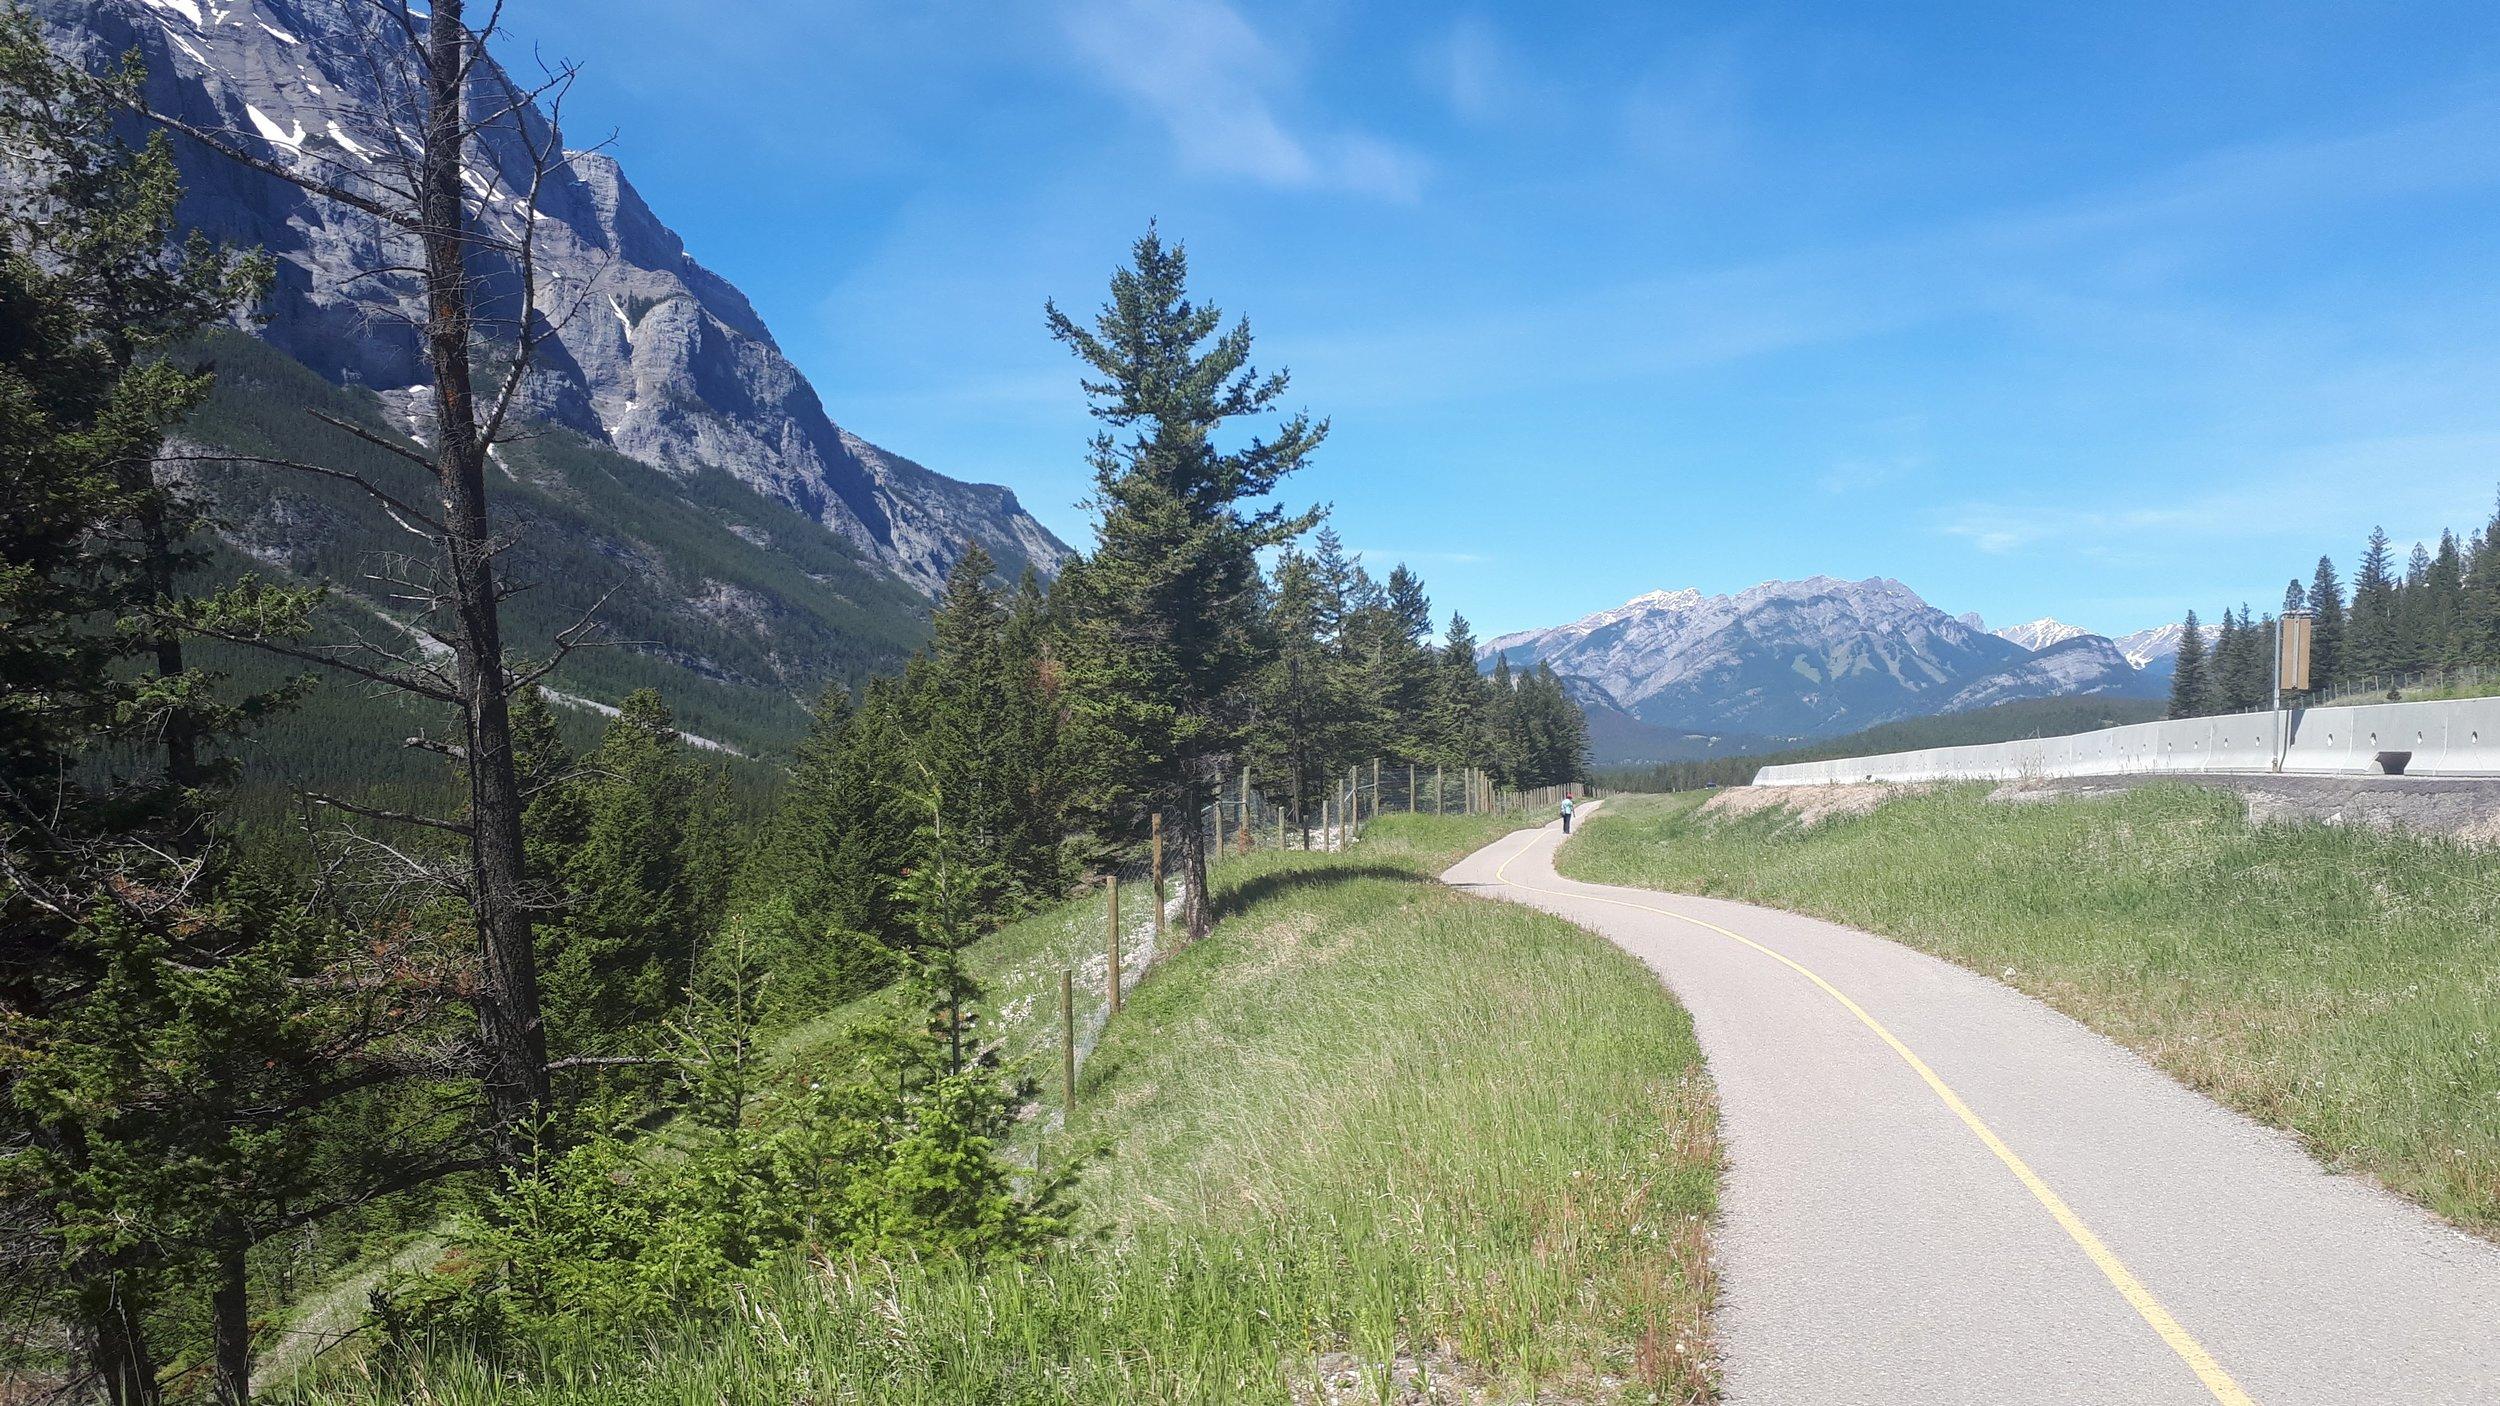 Legacy Trail riding towards Banff.